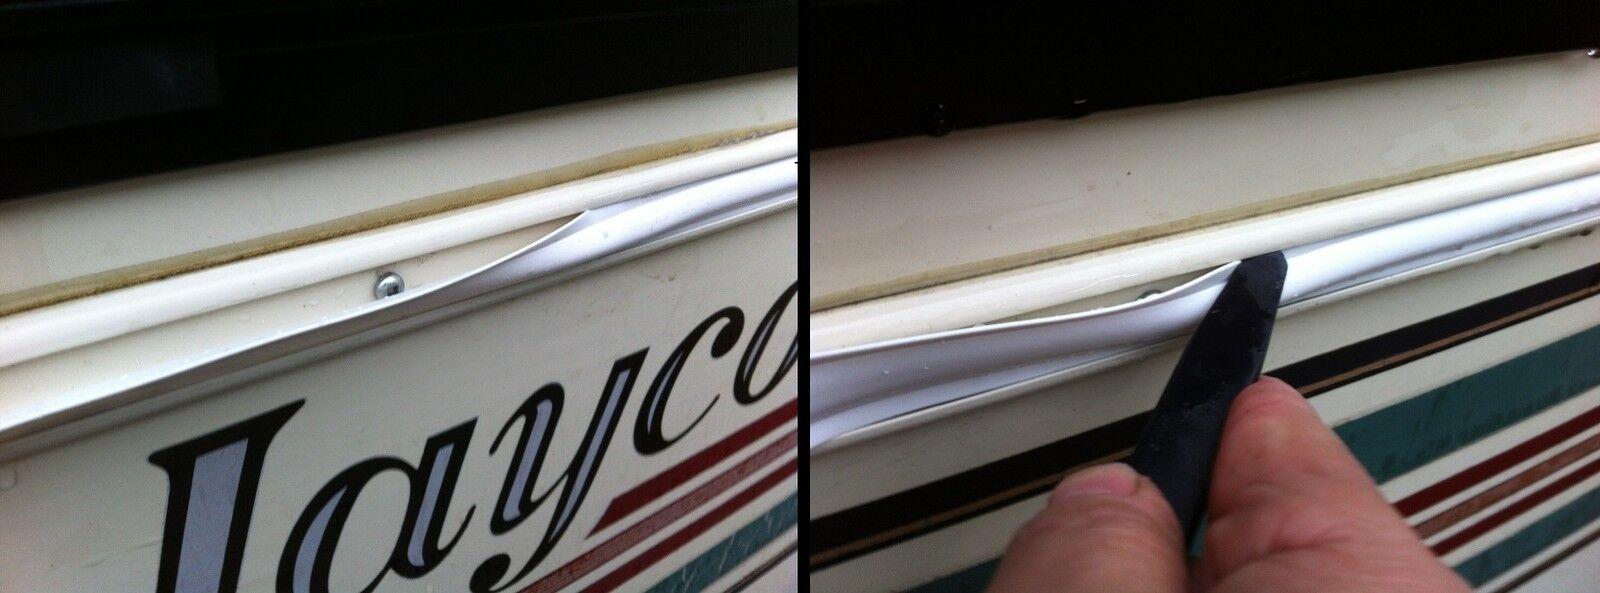 1 X 75 Ft Black Vinyl Trim Molding Screw Cover Rv Boat Camper Travel Trailer Picclick